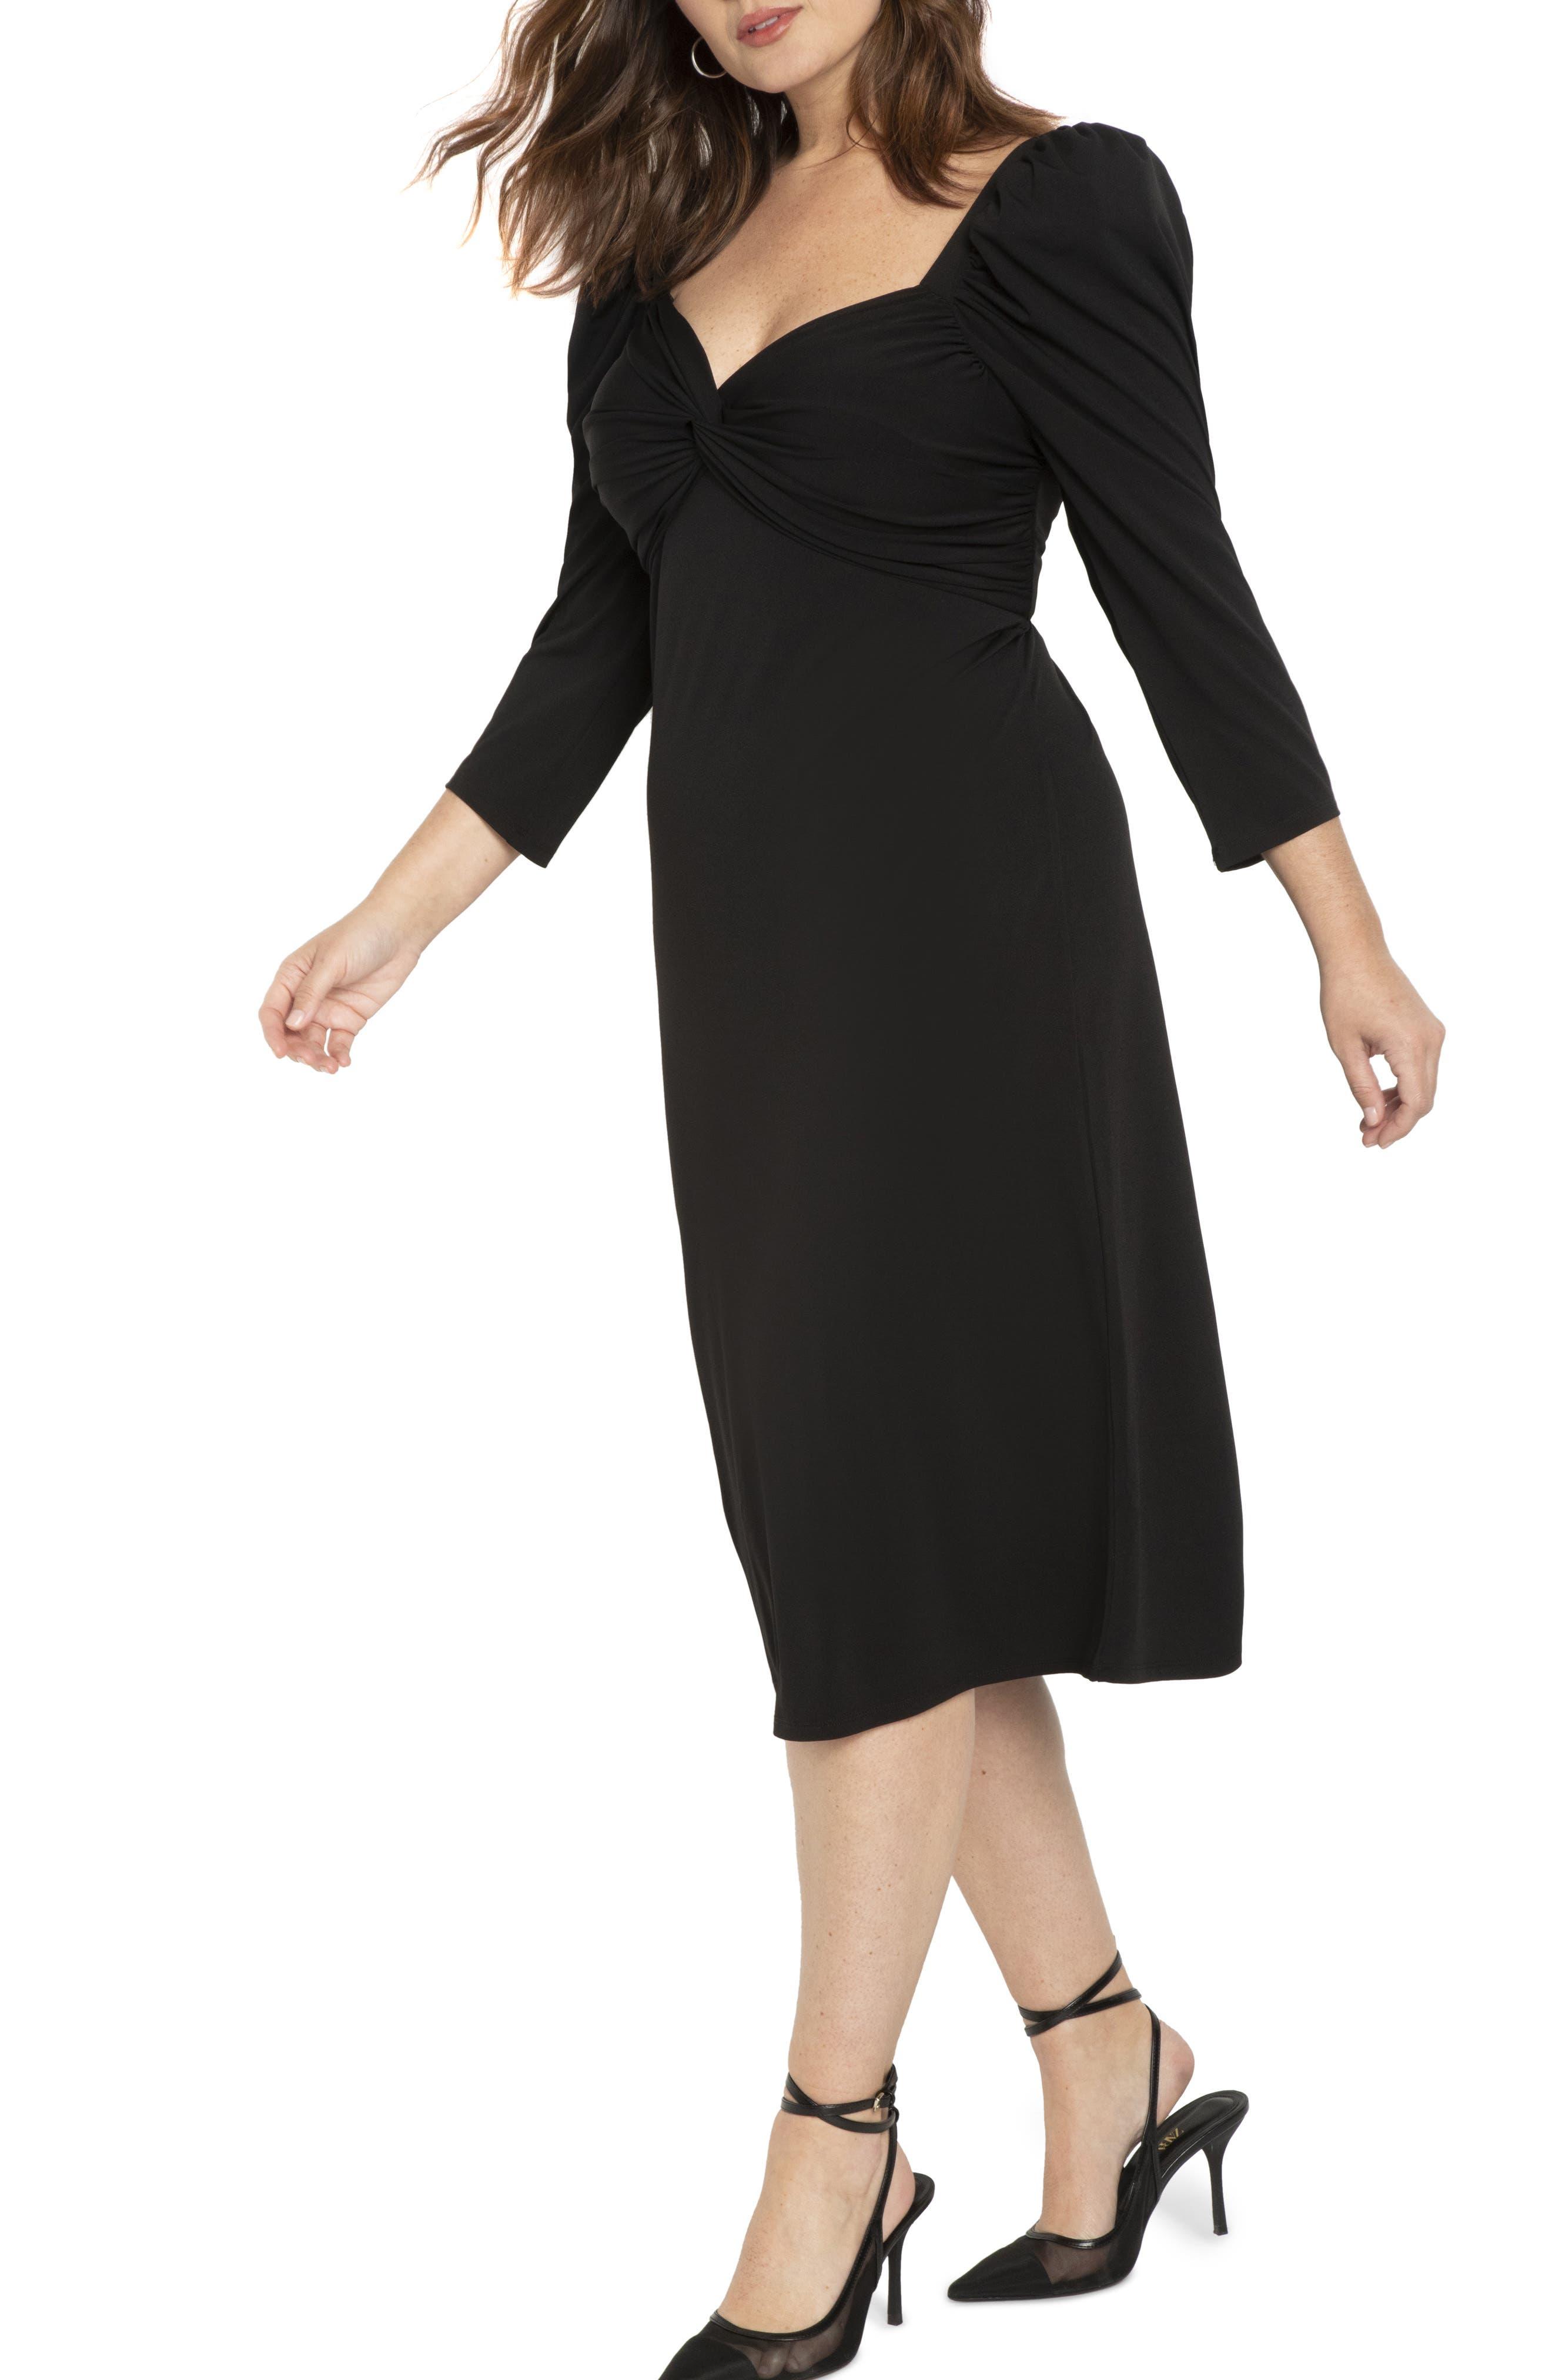 1940s Dresses | 40s Dress, Swing Dress, Tea Dresses Plus Size Womens Eloquii Puff Sleeve Midi Dress Size 22W - Black $59.98 AT vintagedancer.com